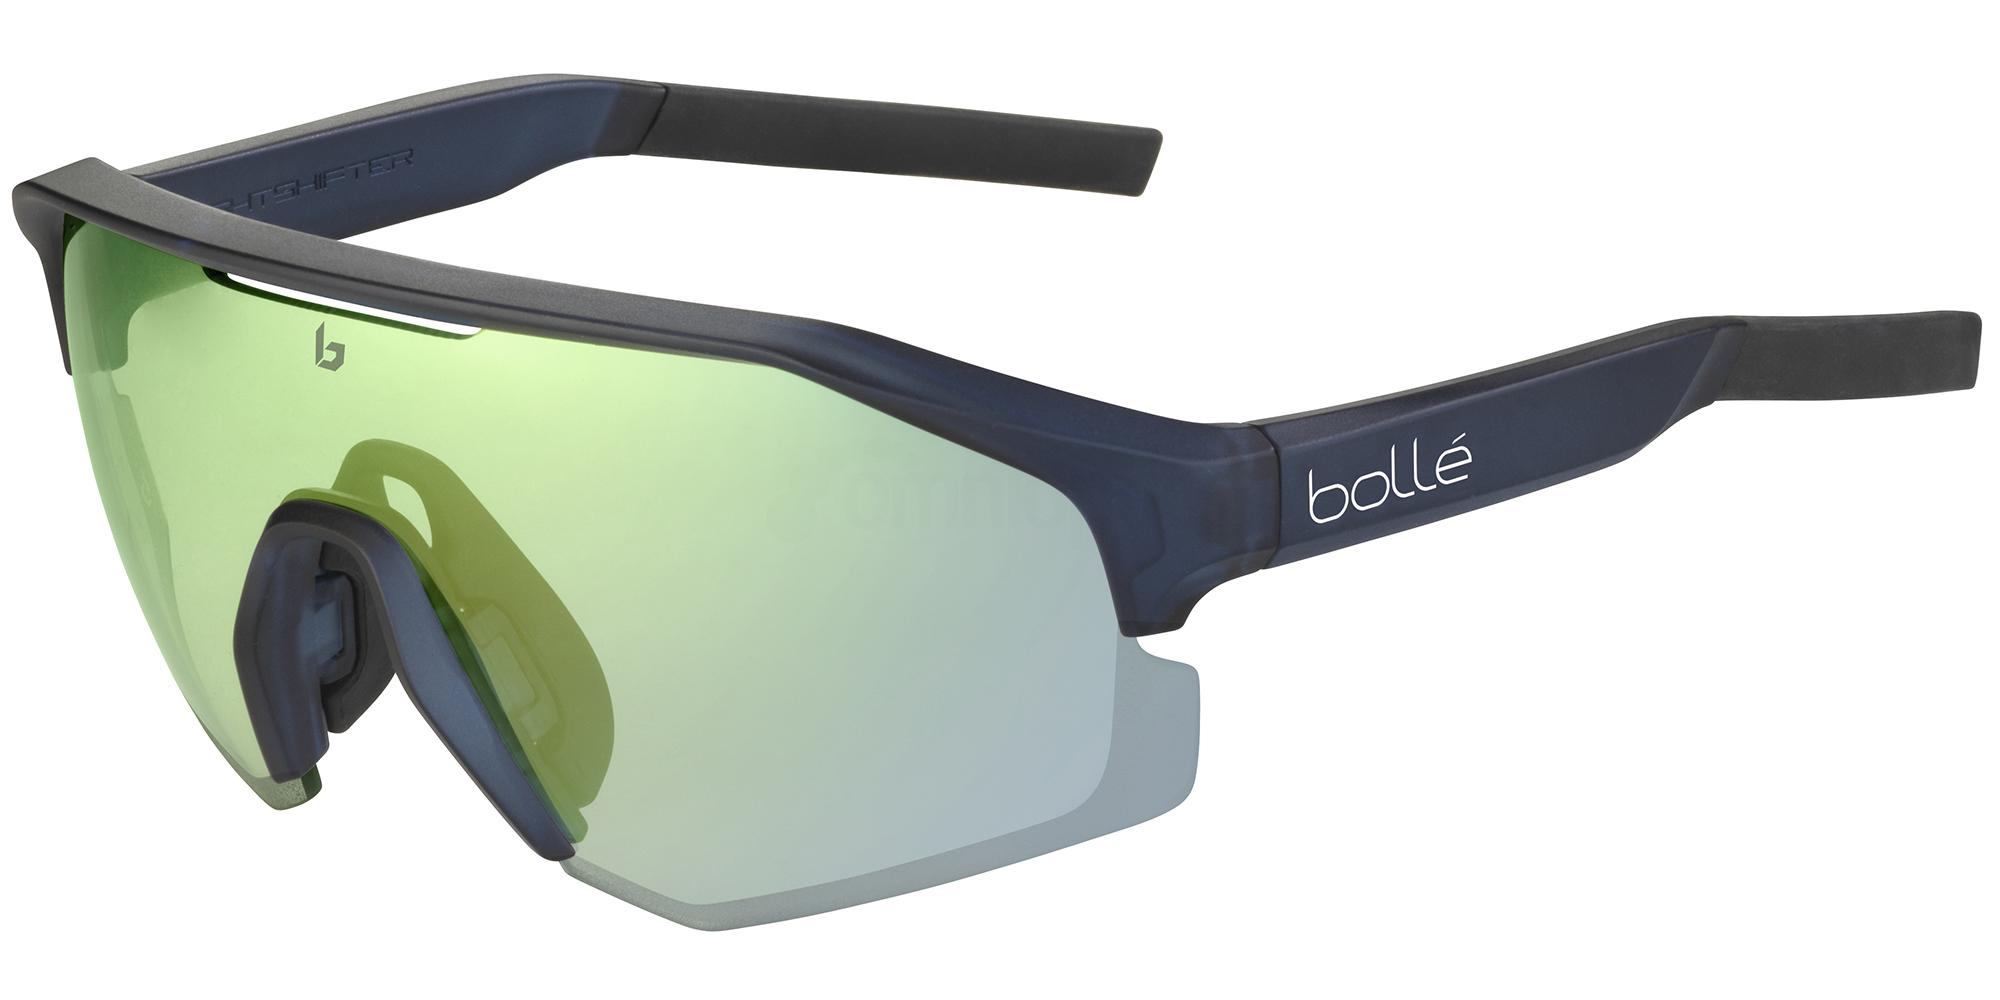 12651 LIGHTSHIFTER Sunglasses, Bolle